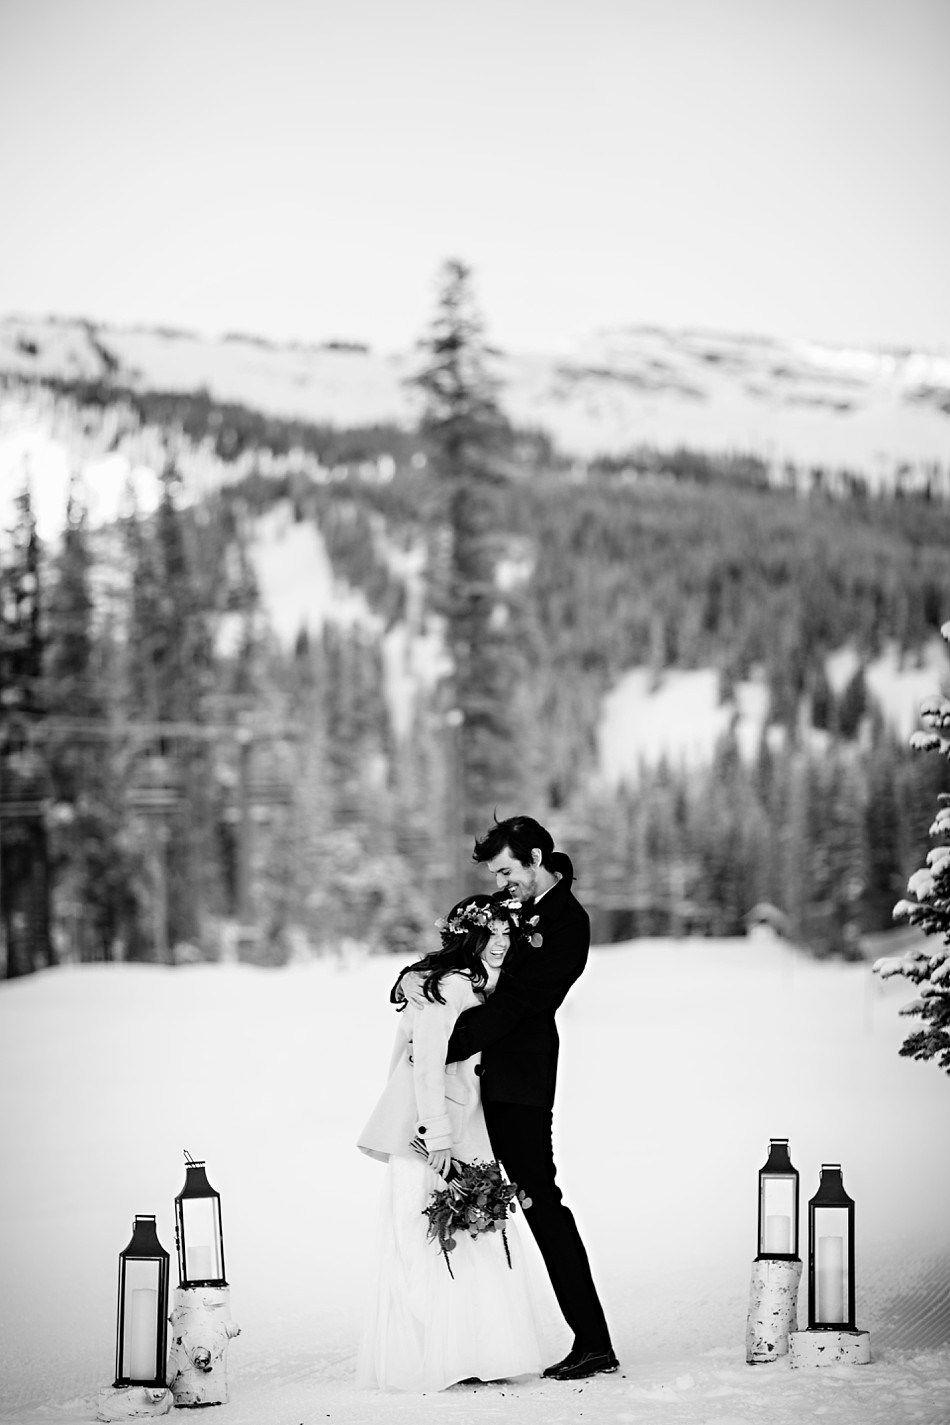 Winter Wedding Photos in Snowmass Colorado Jason+Gina Wedding Photographers http://www.jason-gina.com #wedding #aspen #snowmass